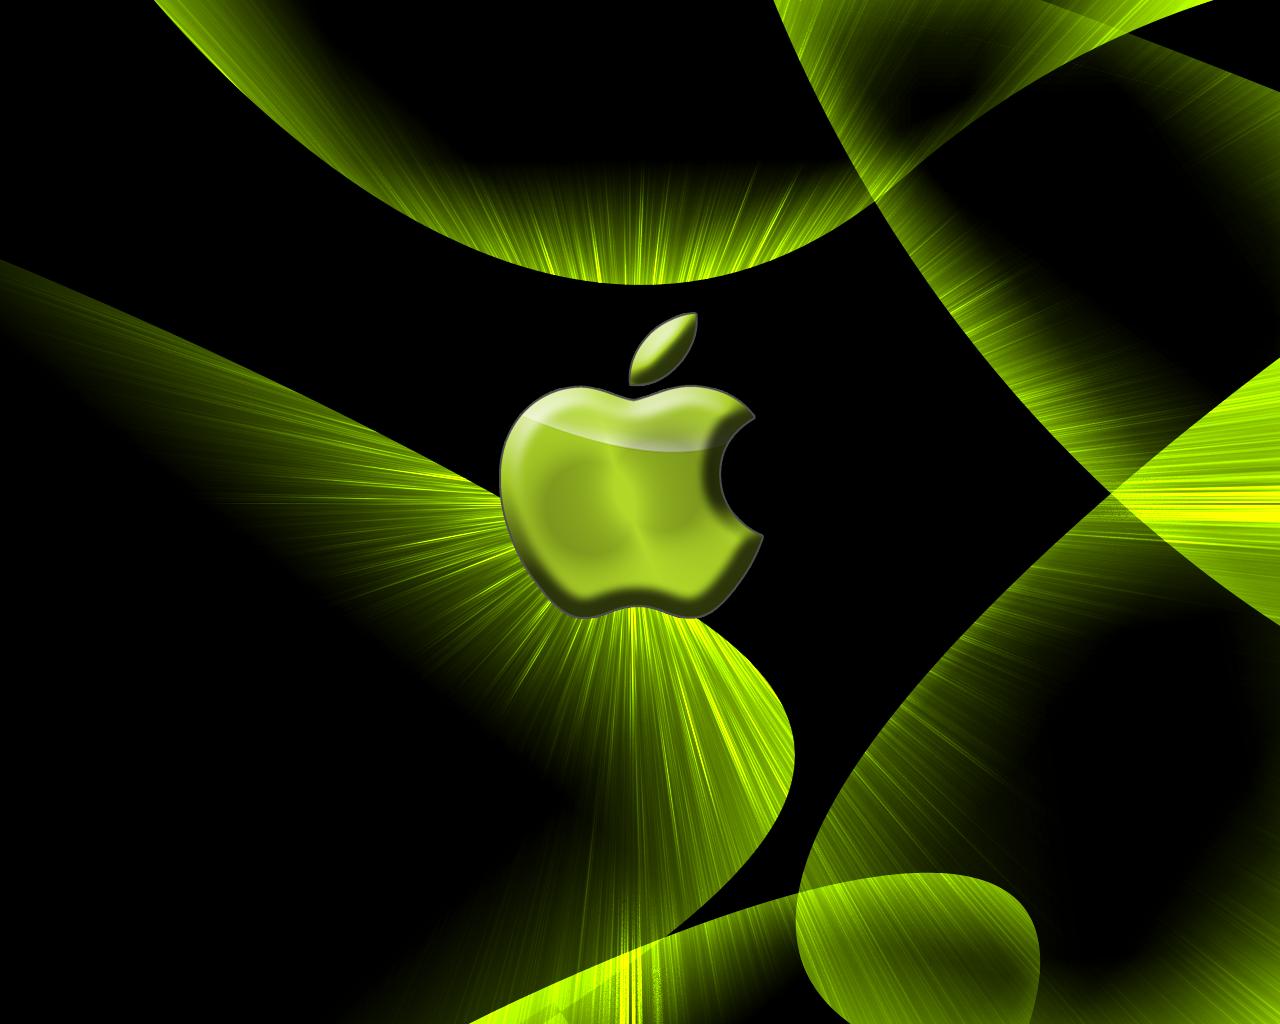 http://3.bp.blogspot.com/-2owsK4ymAkw/Tcn1L714AtI/AAAAAAAACL0/gQLFA0bhugQ/s1600/Black_aqua_wallpaper_w__apple_by_Innercityghettozone.png